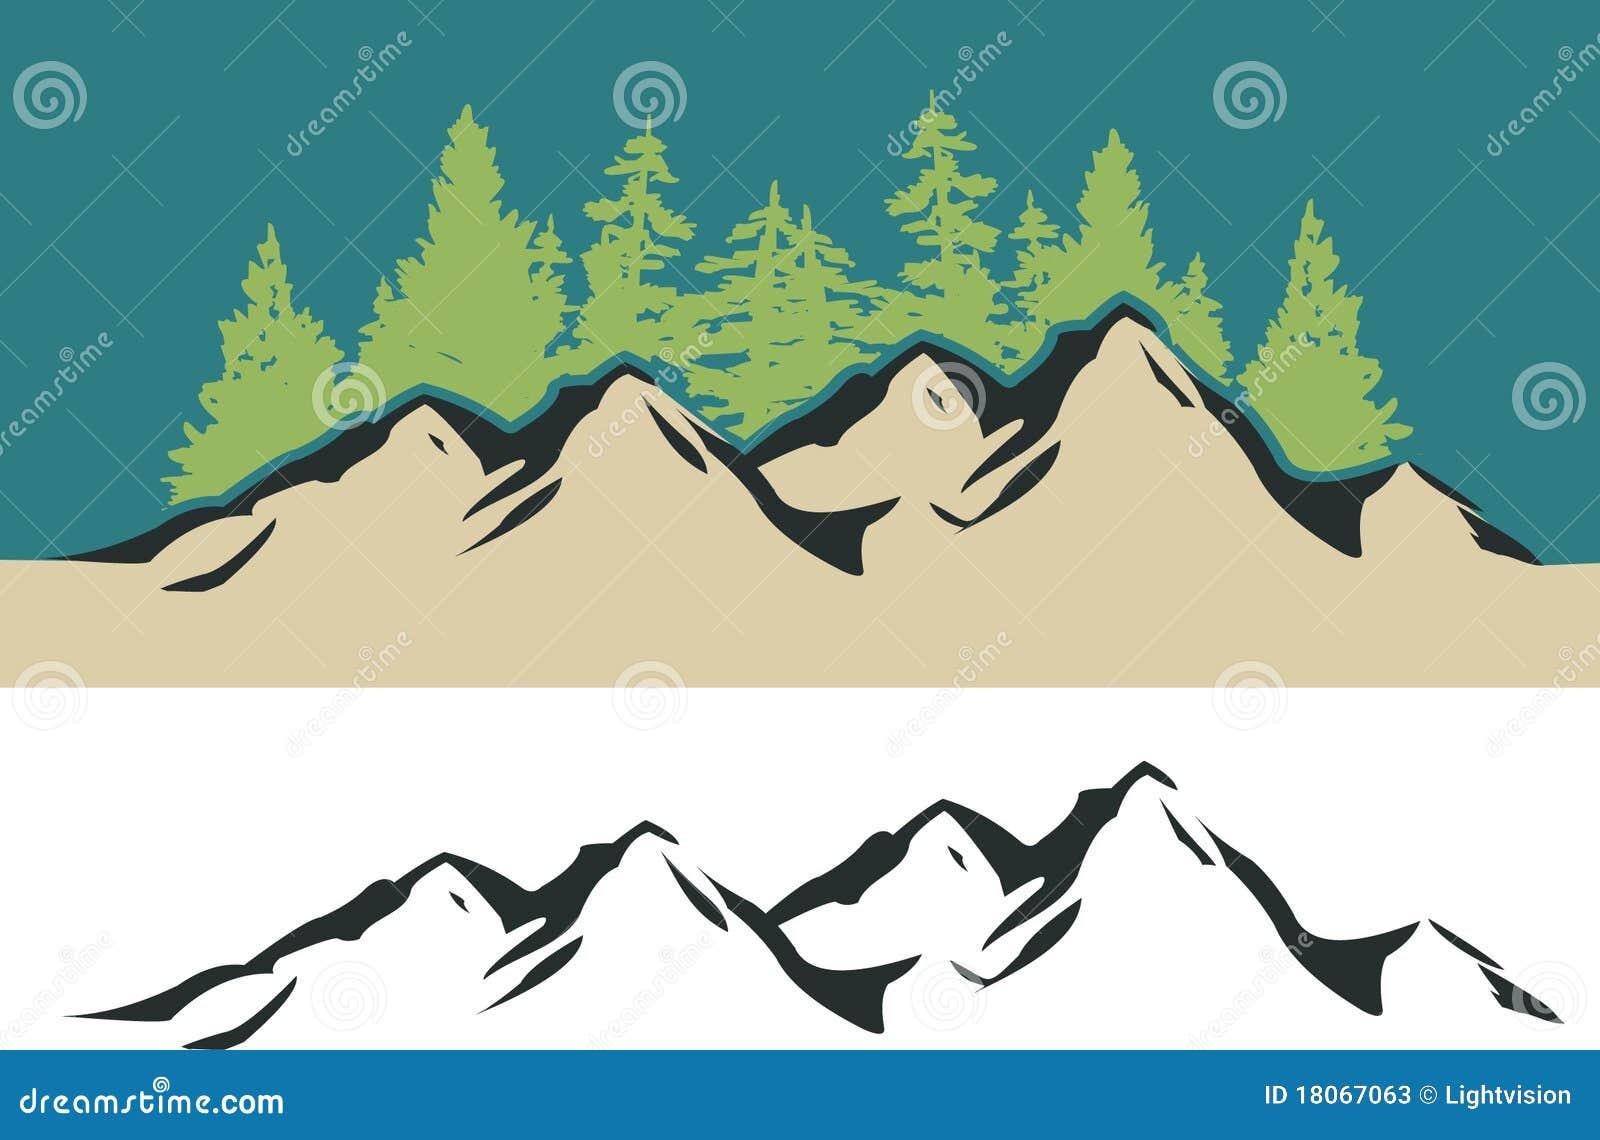 Mountain Trees Stock Illustrations 27 391 Mountain Trees Stock Illustrations Vectors Clipart Dreamstime